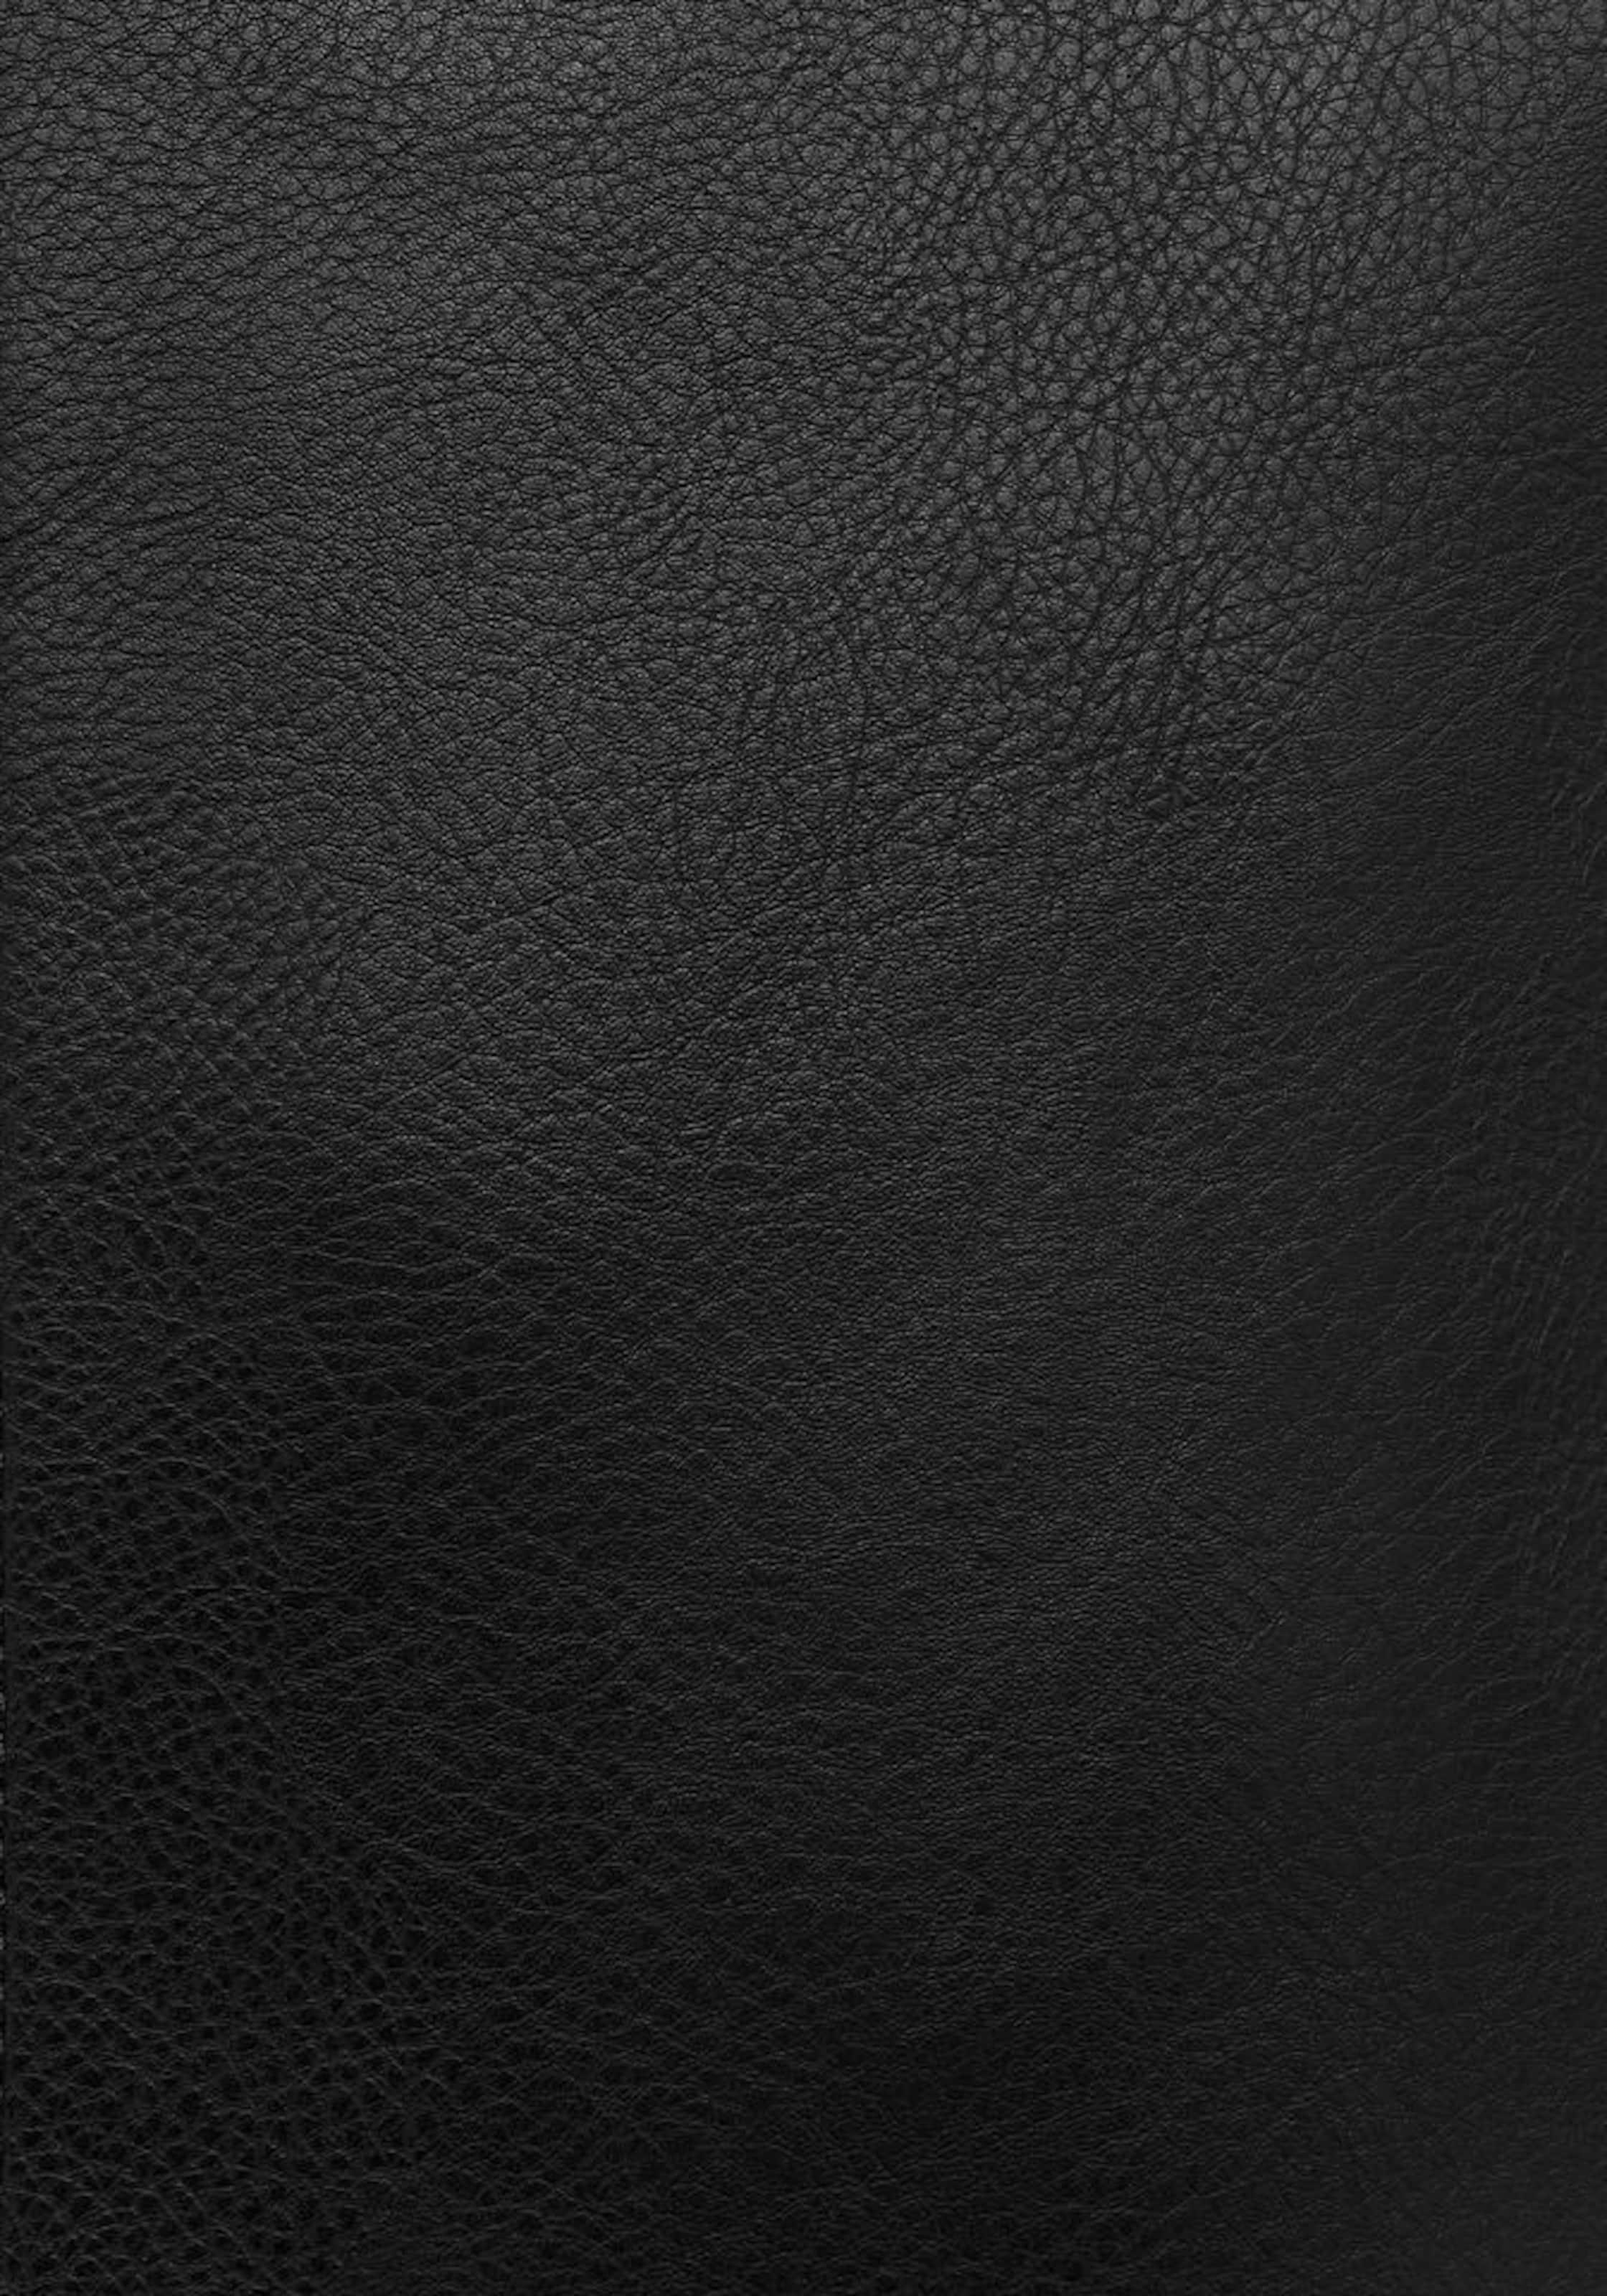 TOM TAILOR Shopper 'ELSA' Niedrige Versandgebühr Online Auslass Eastbay Rabatt Professionelle Billig 2018 WZo1U9H